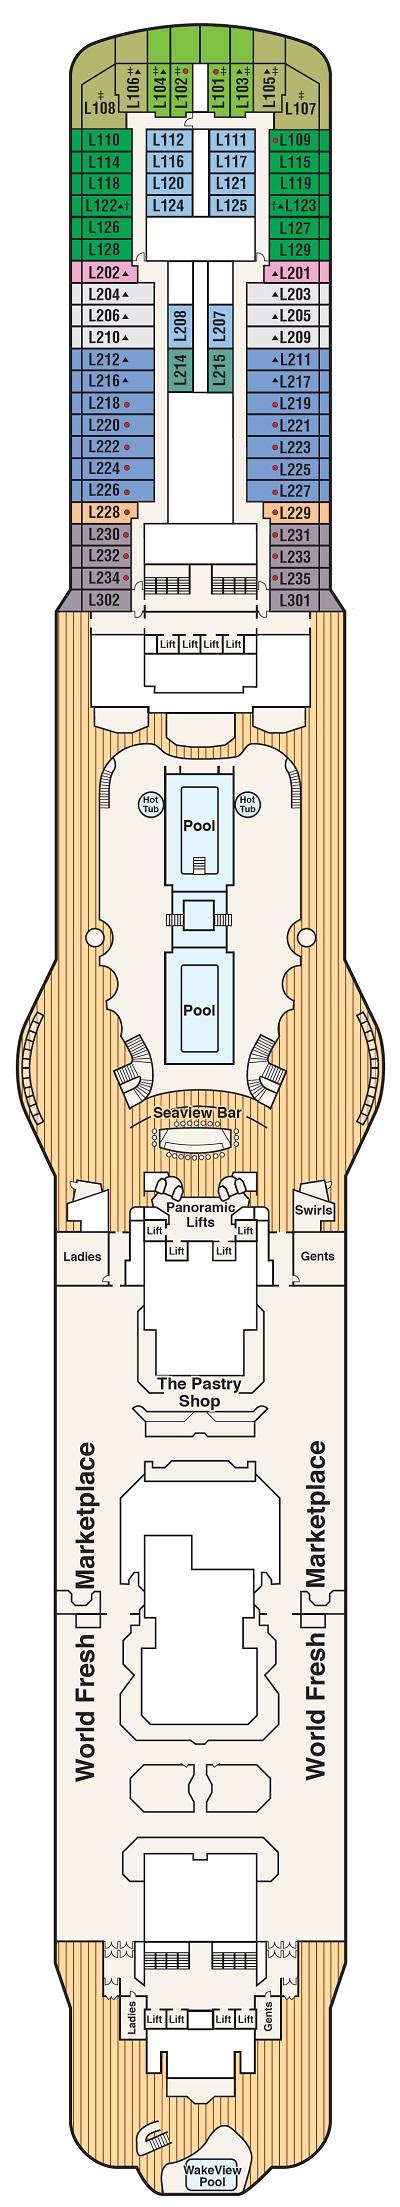 Deck 16 - Lido